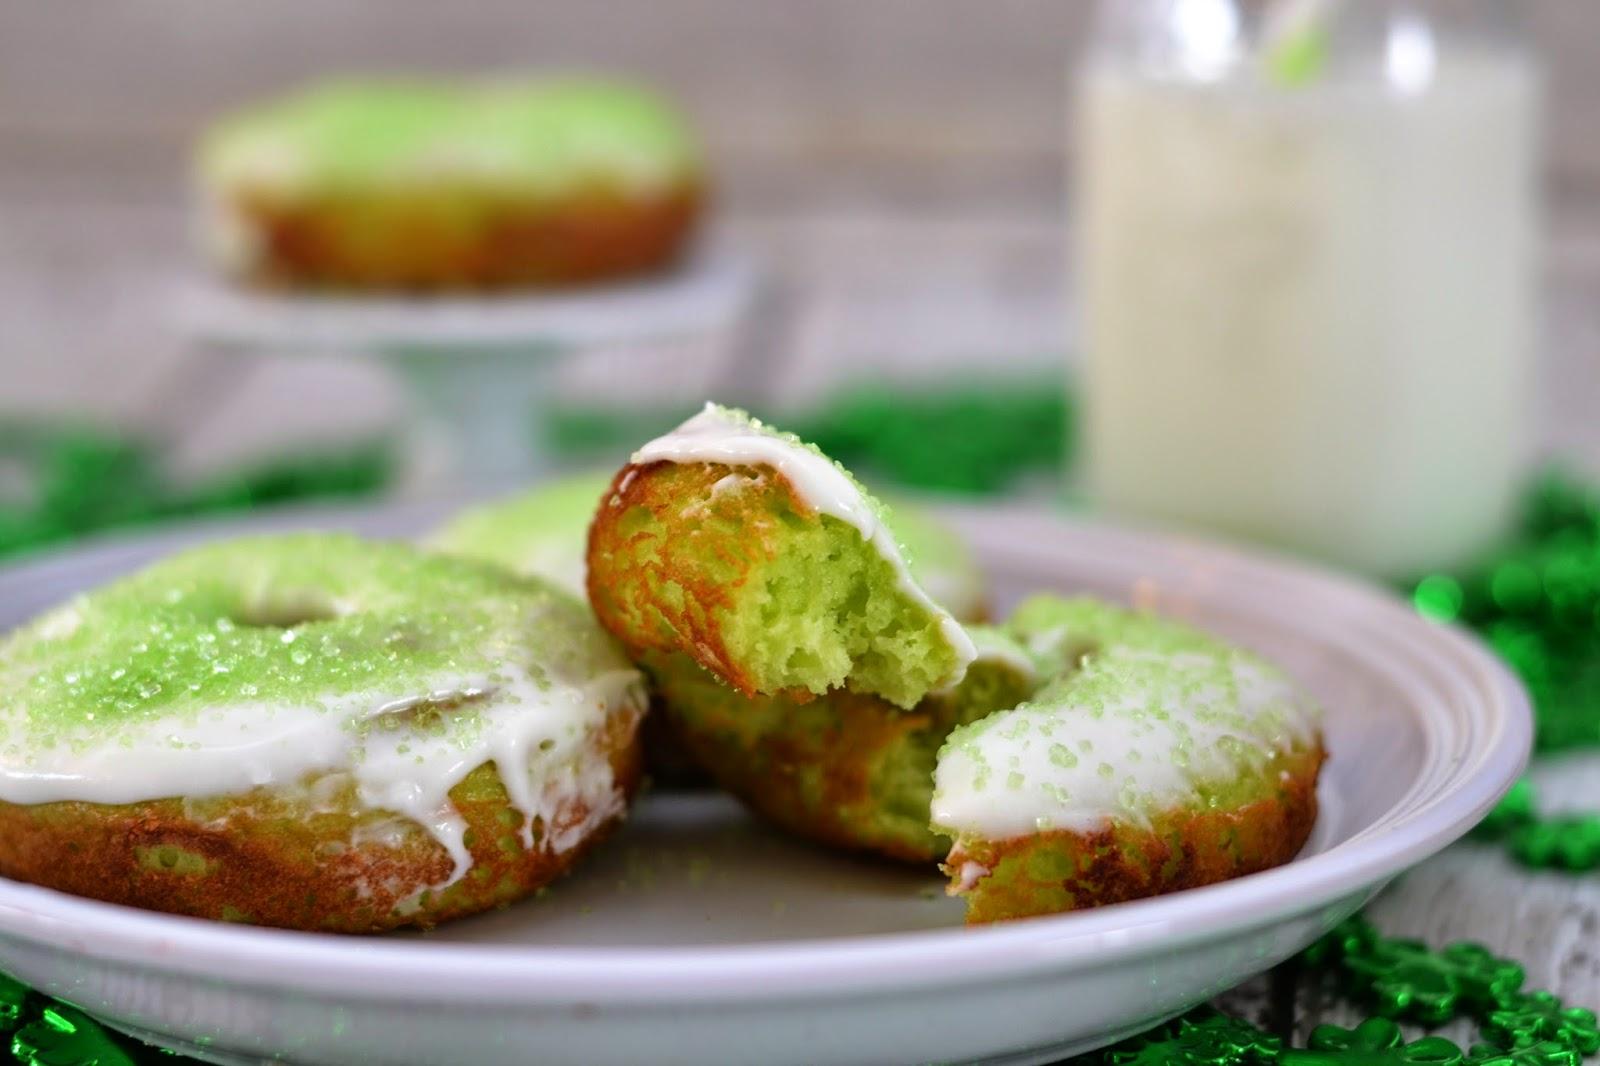 Shamrock Glazed Donuts #Recipe. Easy Donut Recipe.  St. Patrick's Day treats.  St. Patrick's Day desserts.  St. Patrick's Day donuts.  Shamrock Donut recipe.  St. Patrick's Day Recipes.